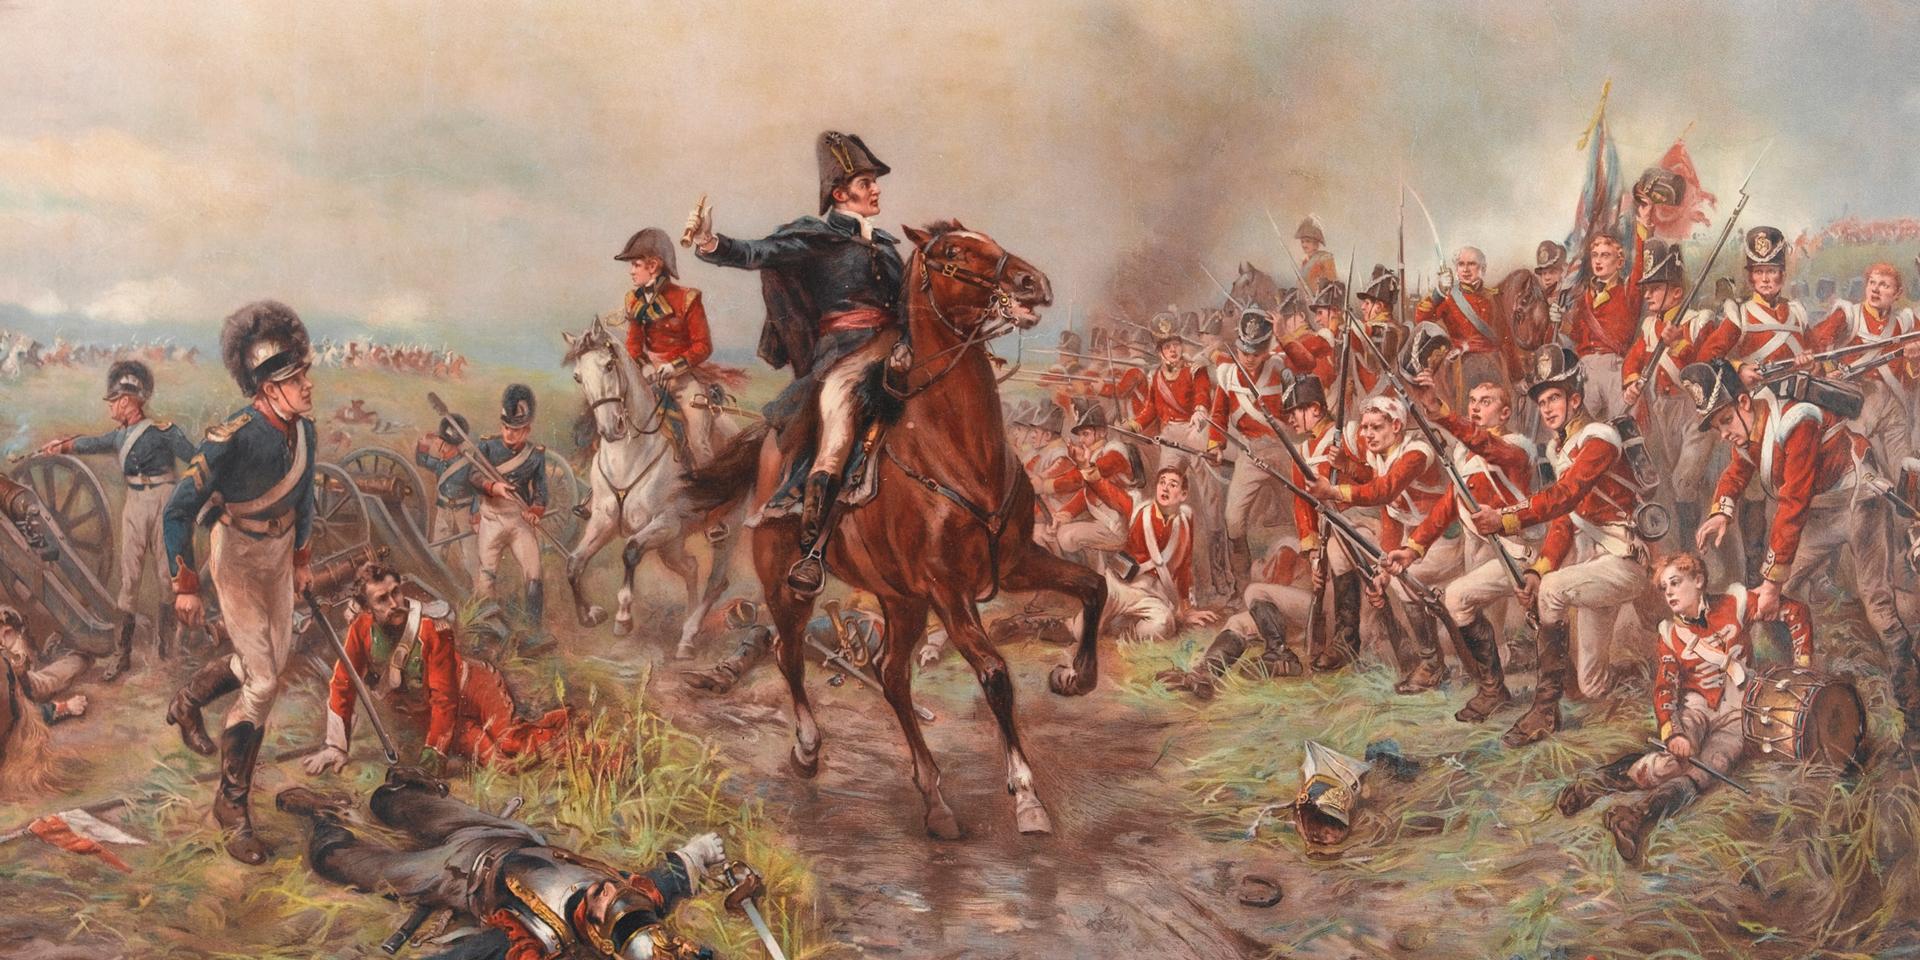 Wellington at Waterloo, 1815